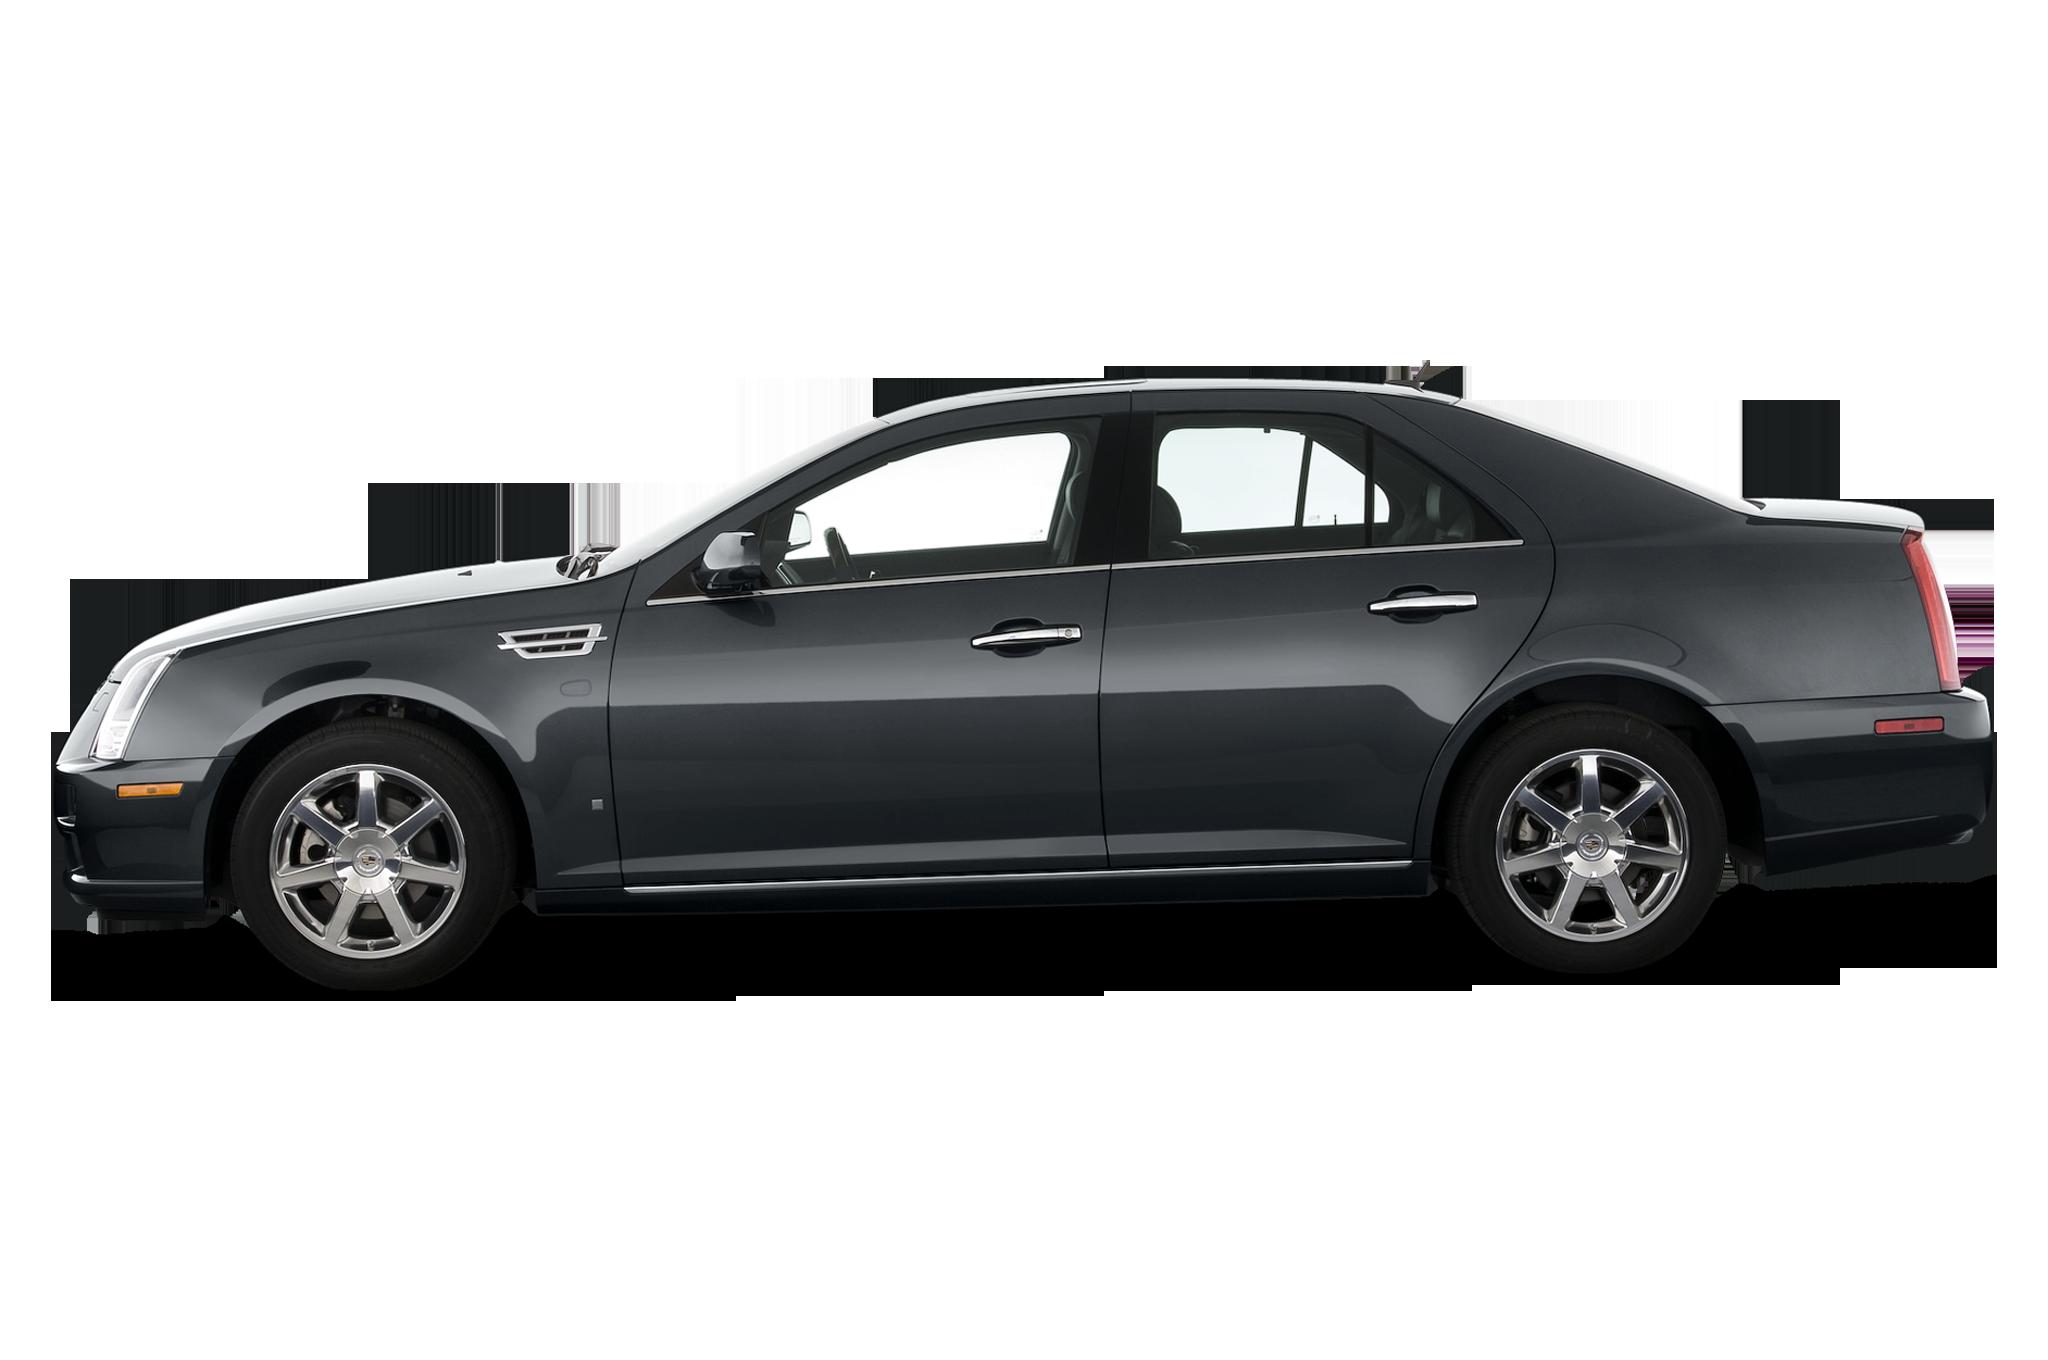 performance angular sport luxury rear wagon review sedan cadillac cts sts news l